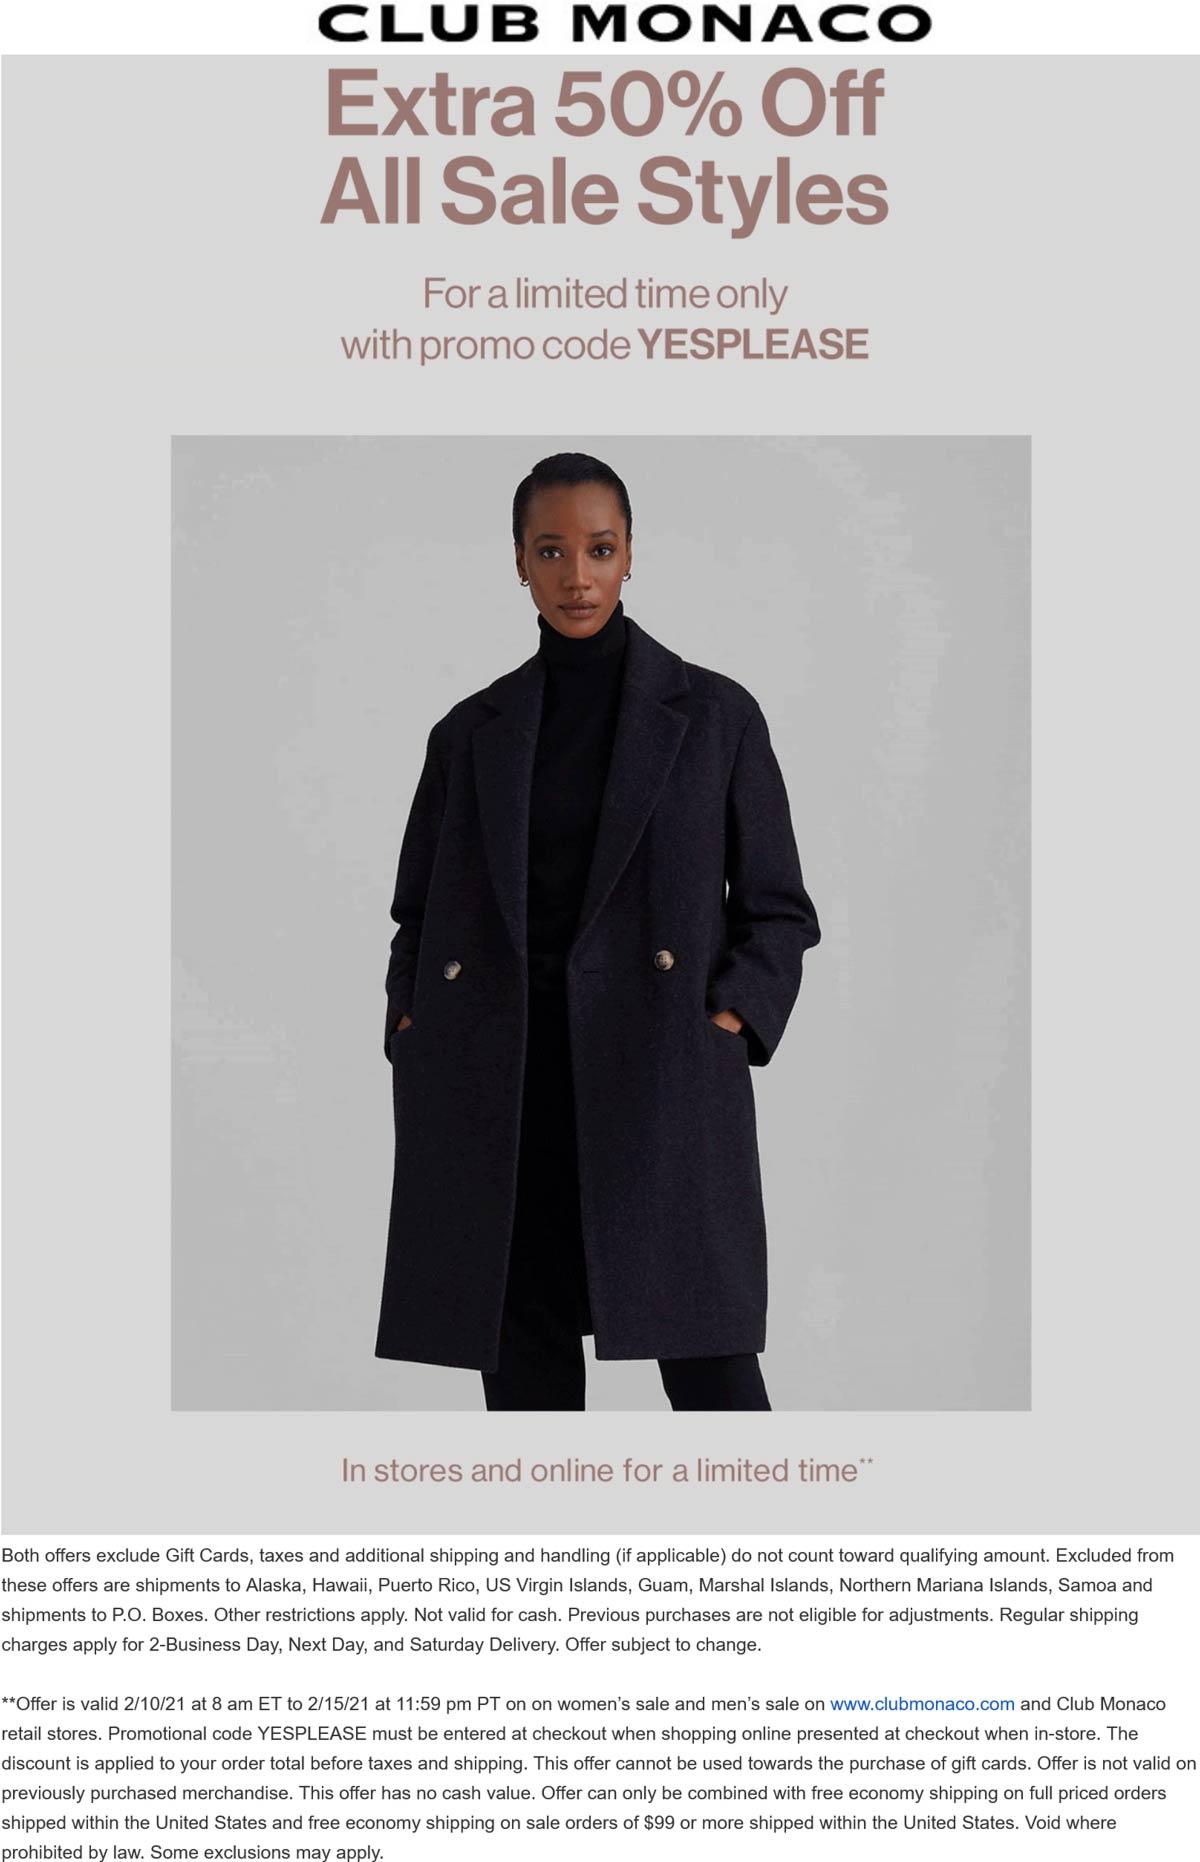 Club Monaco stores Coupon  Extra 50% off sale styles today at Club Monaco, or online via promo code YESPLEASE #clubmonaco